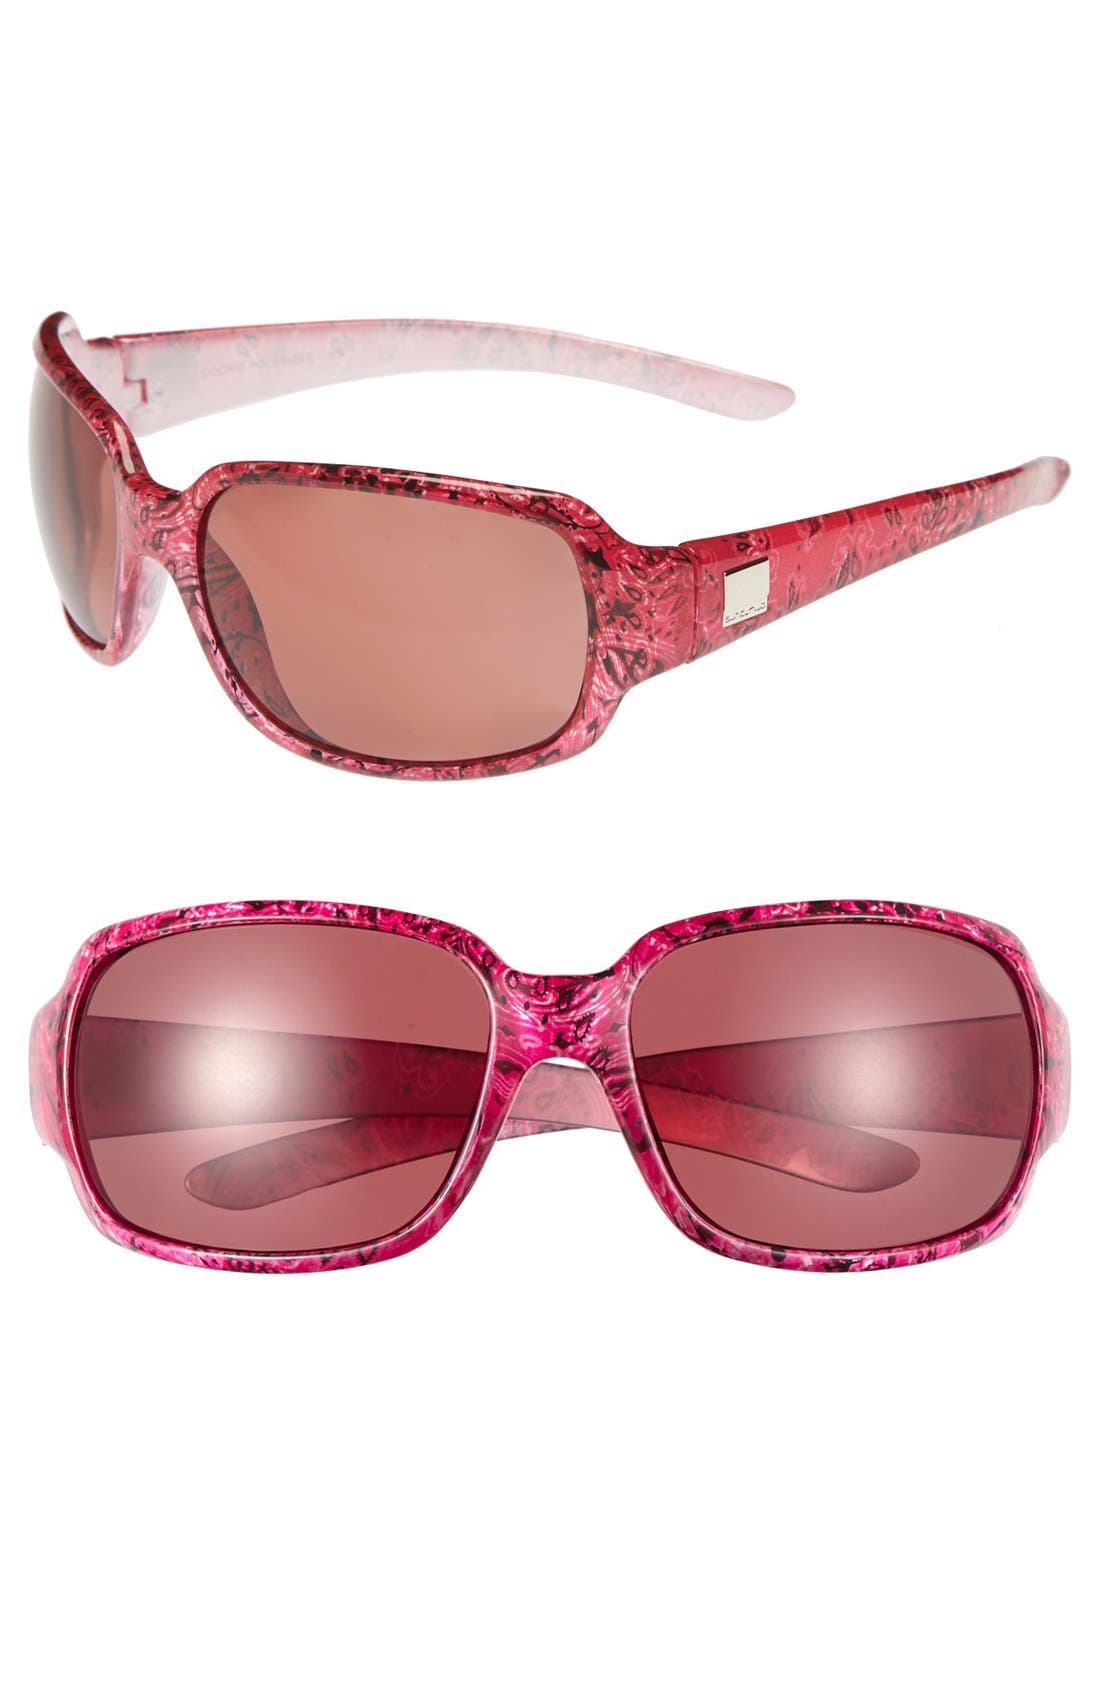 Main Image - Suncloud 'Cookie' Polarized Sunglasses